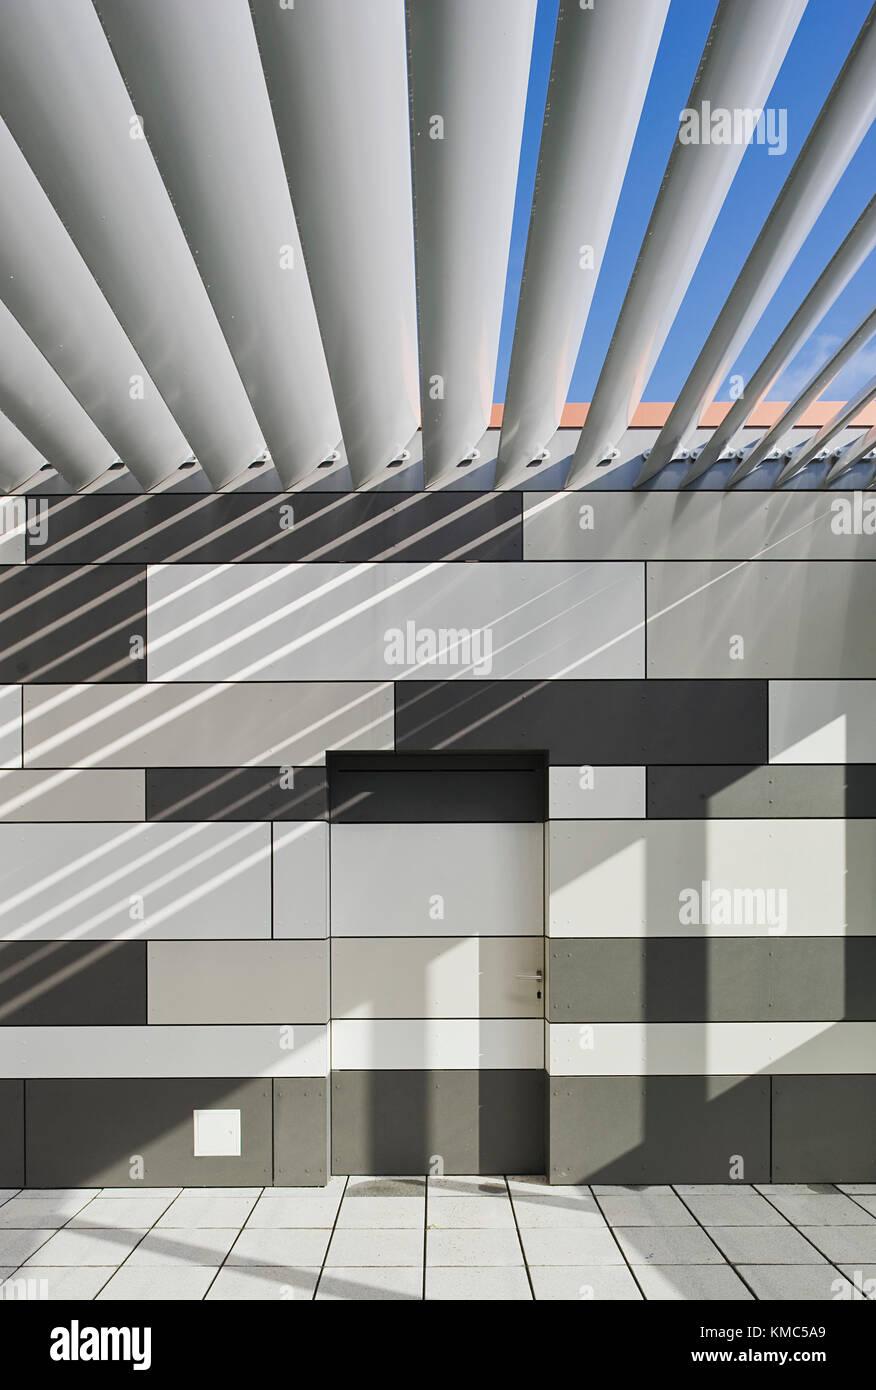 Form, Farbe, Wand, Fliese, Struktur, schwarz, weiß, Lamelle, Sonne Stockbild